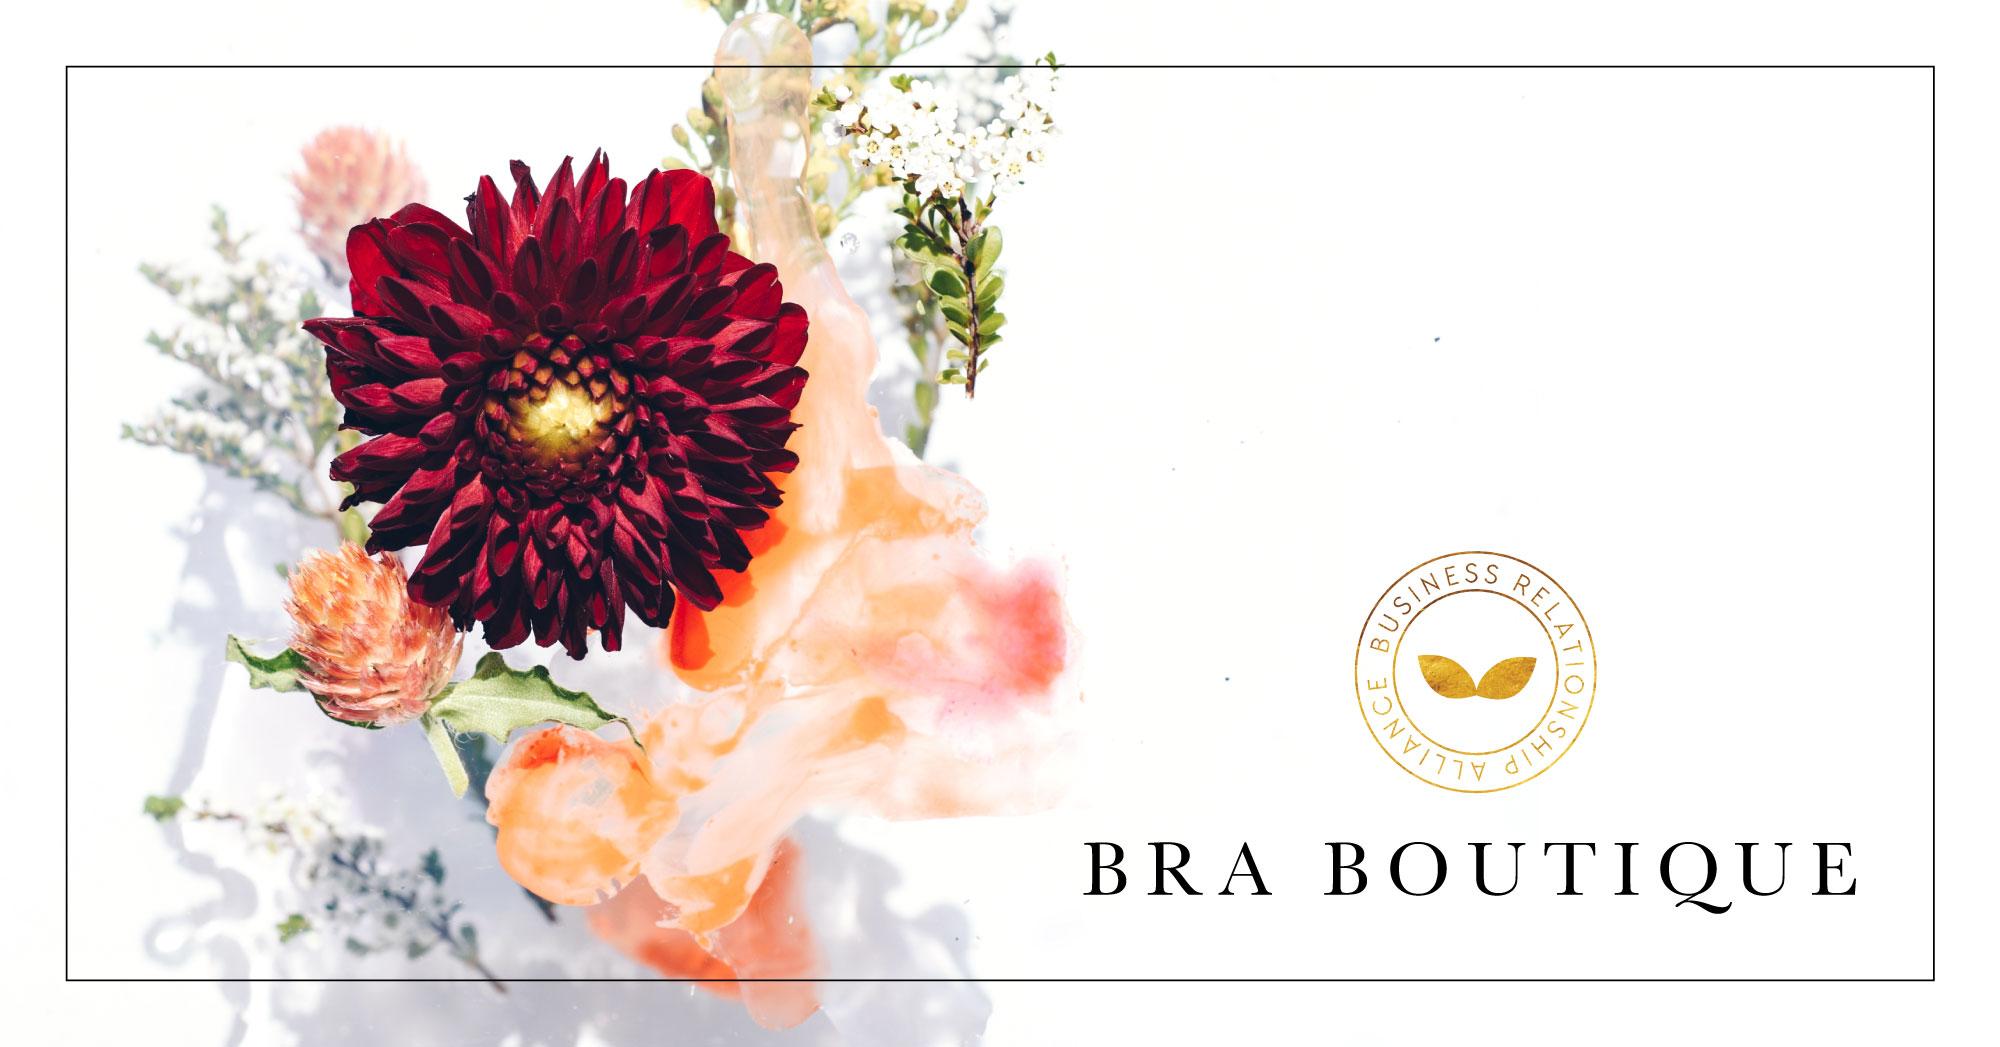 BRA Boutique on November 24, 2018